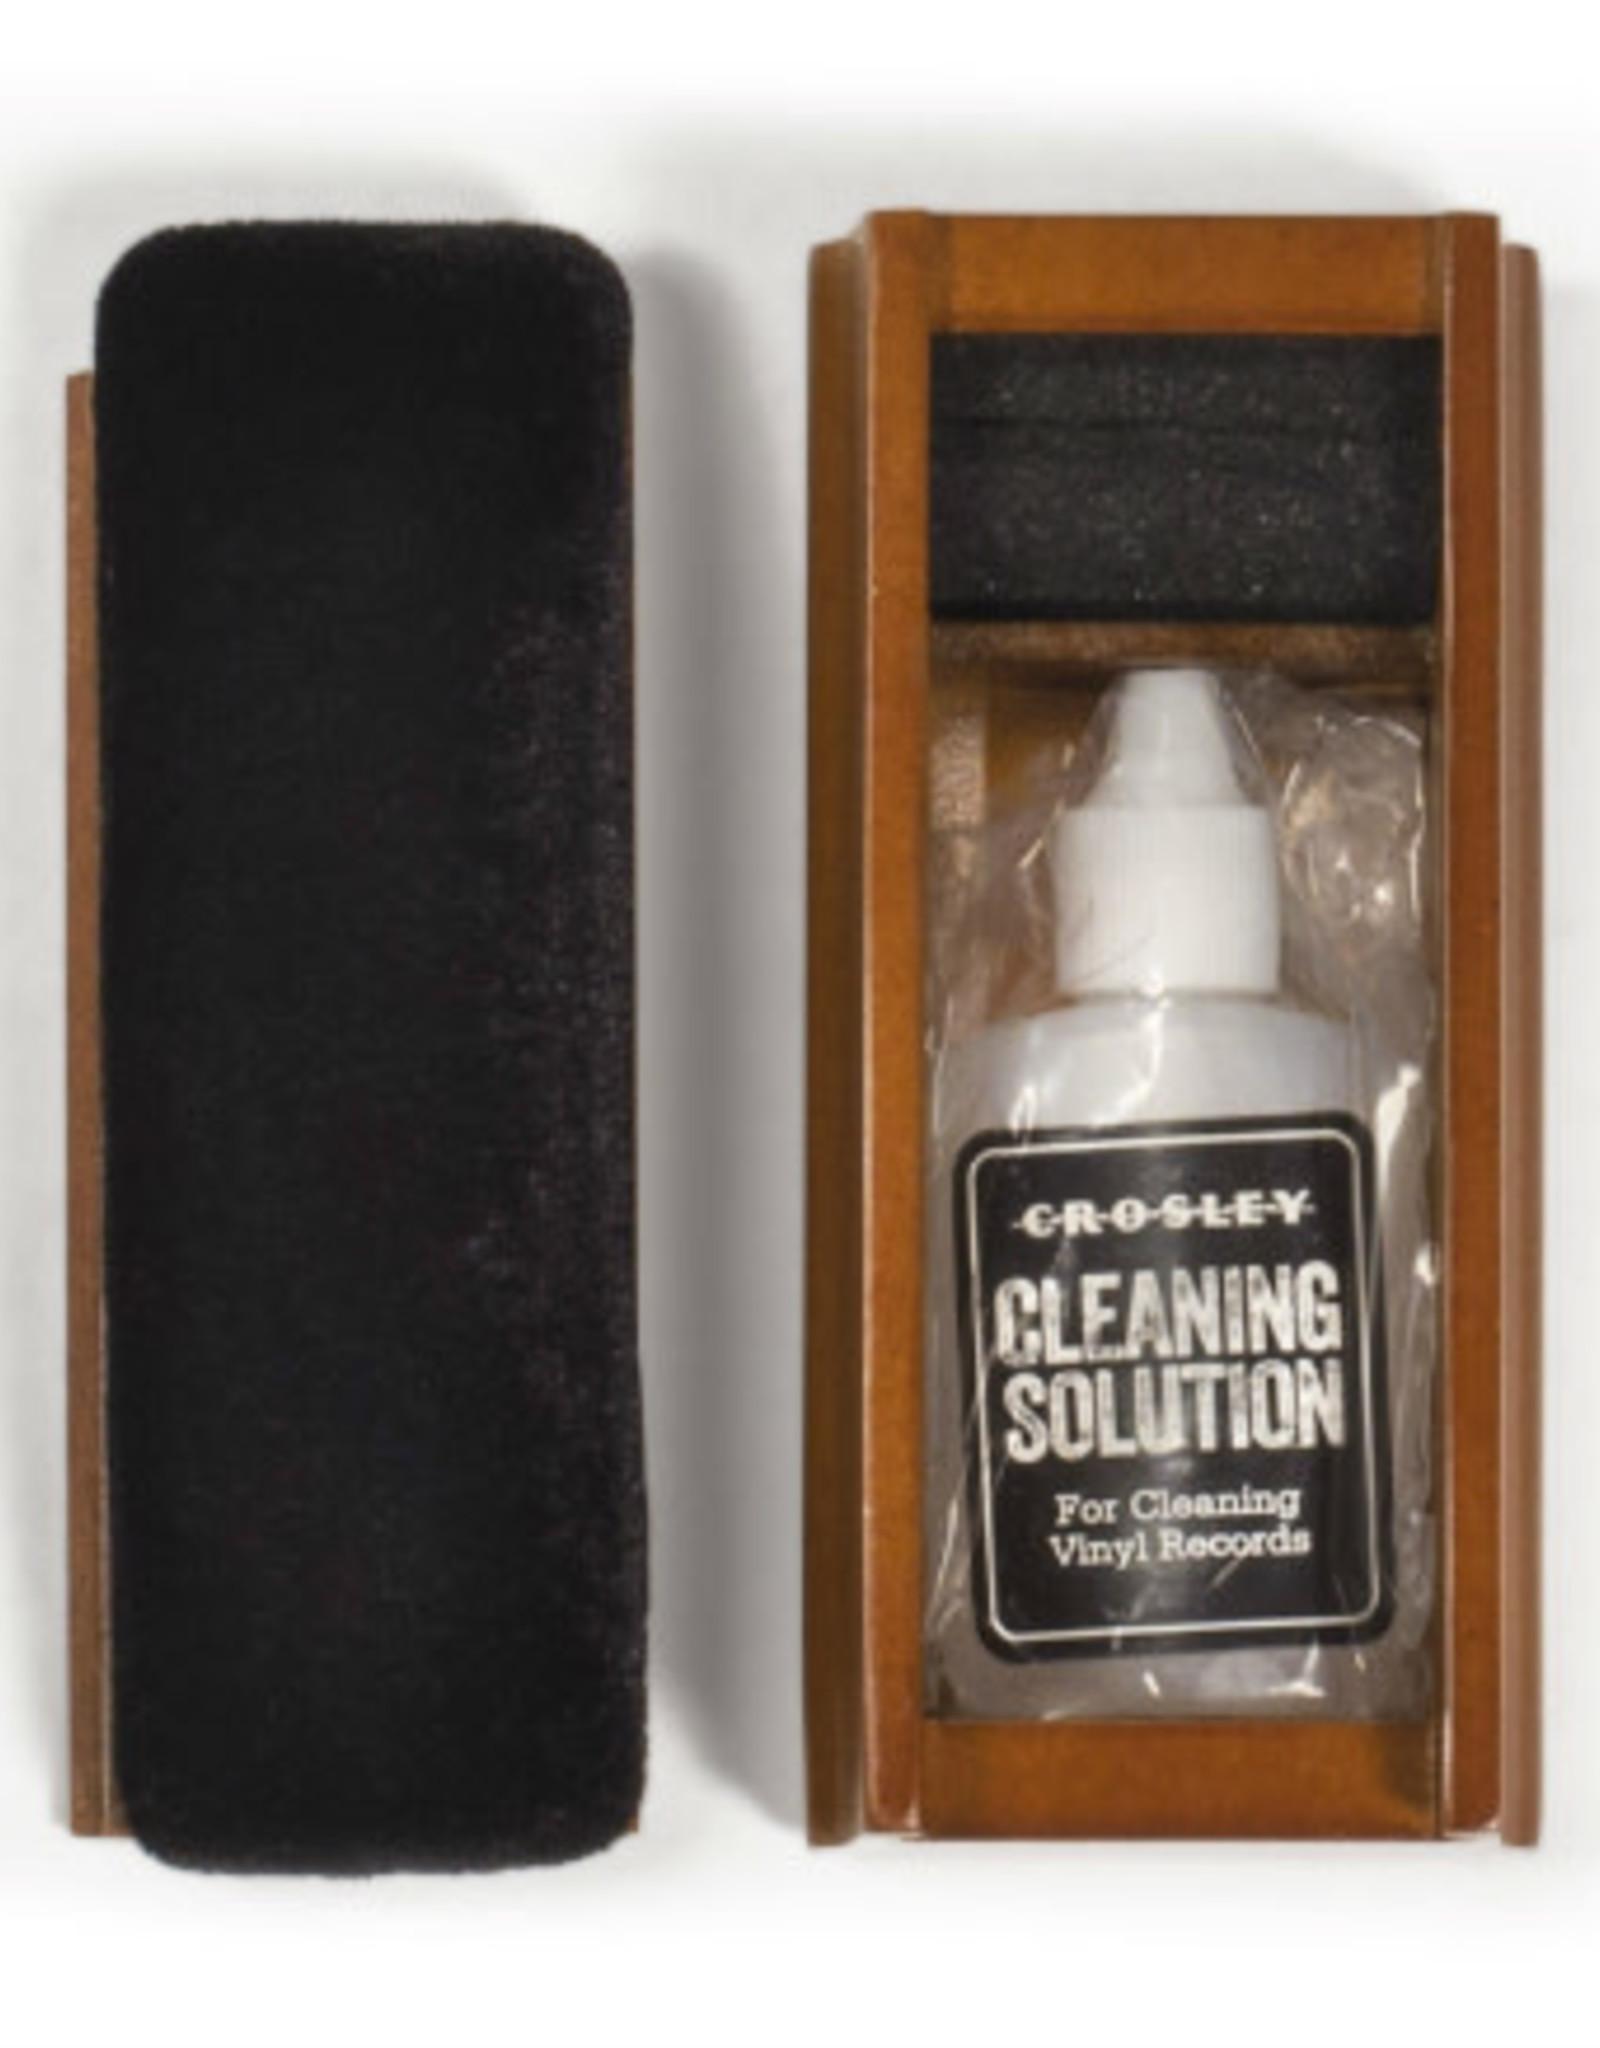 Byrdland Crosley Cleaning Kit